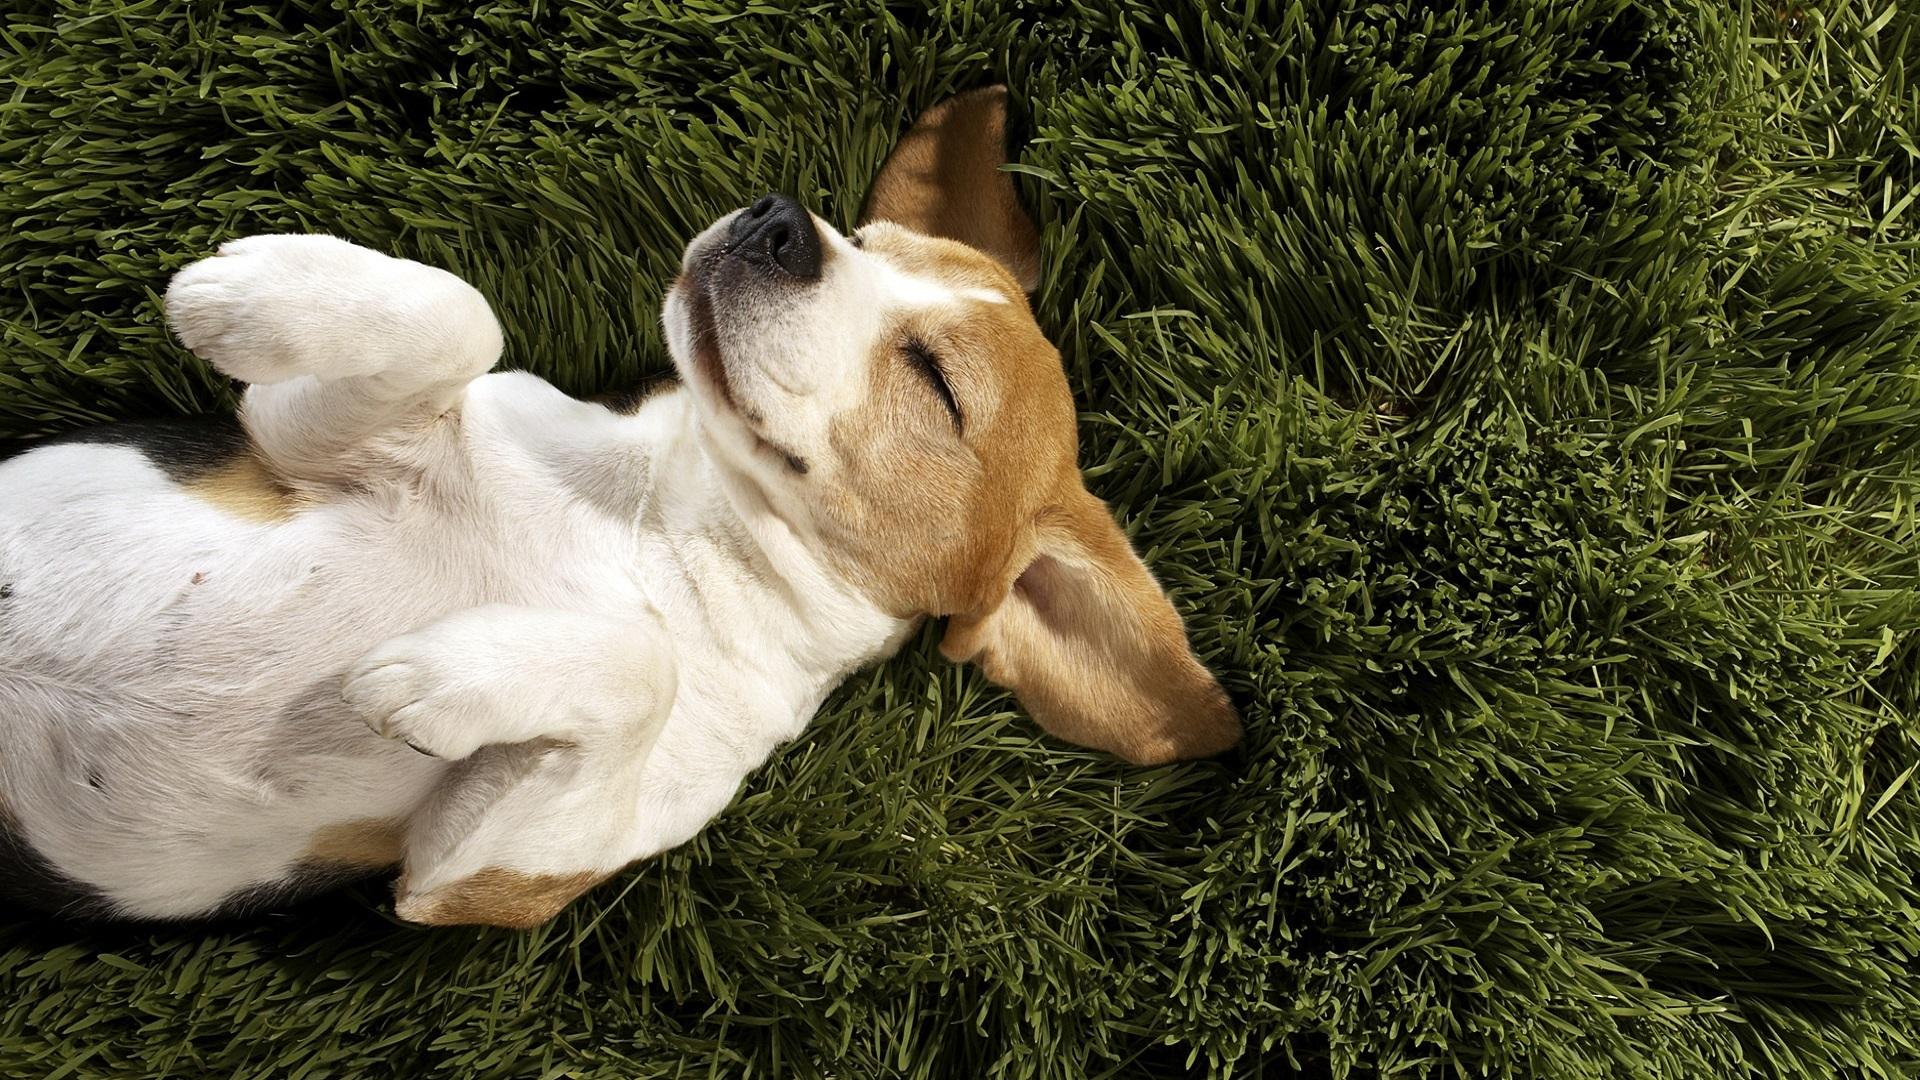 Adorable Happy Dog Wallpaper